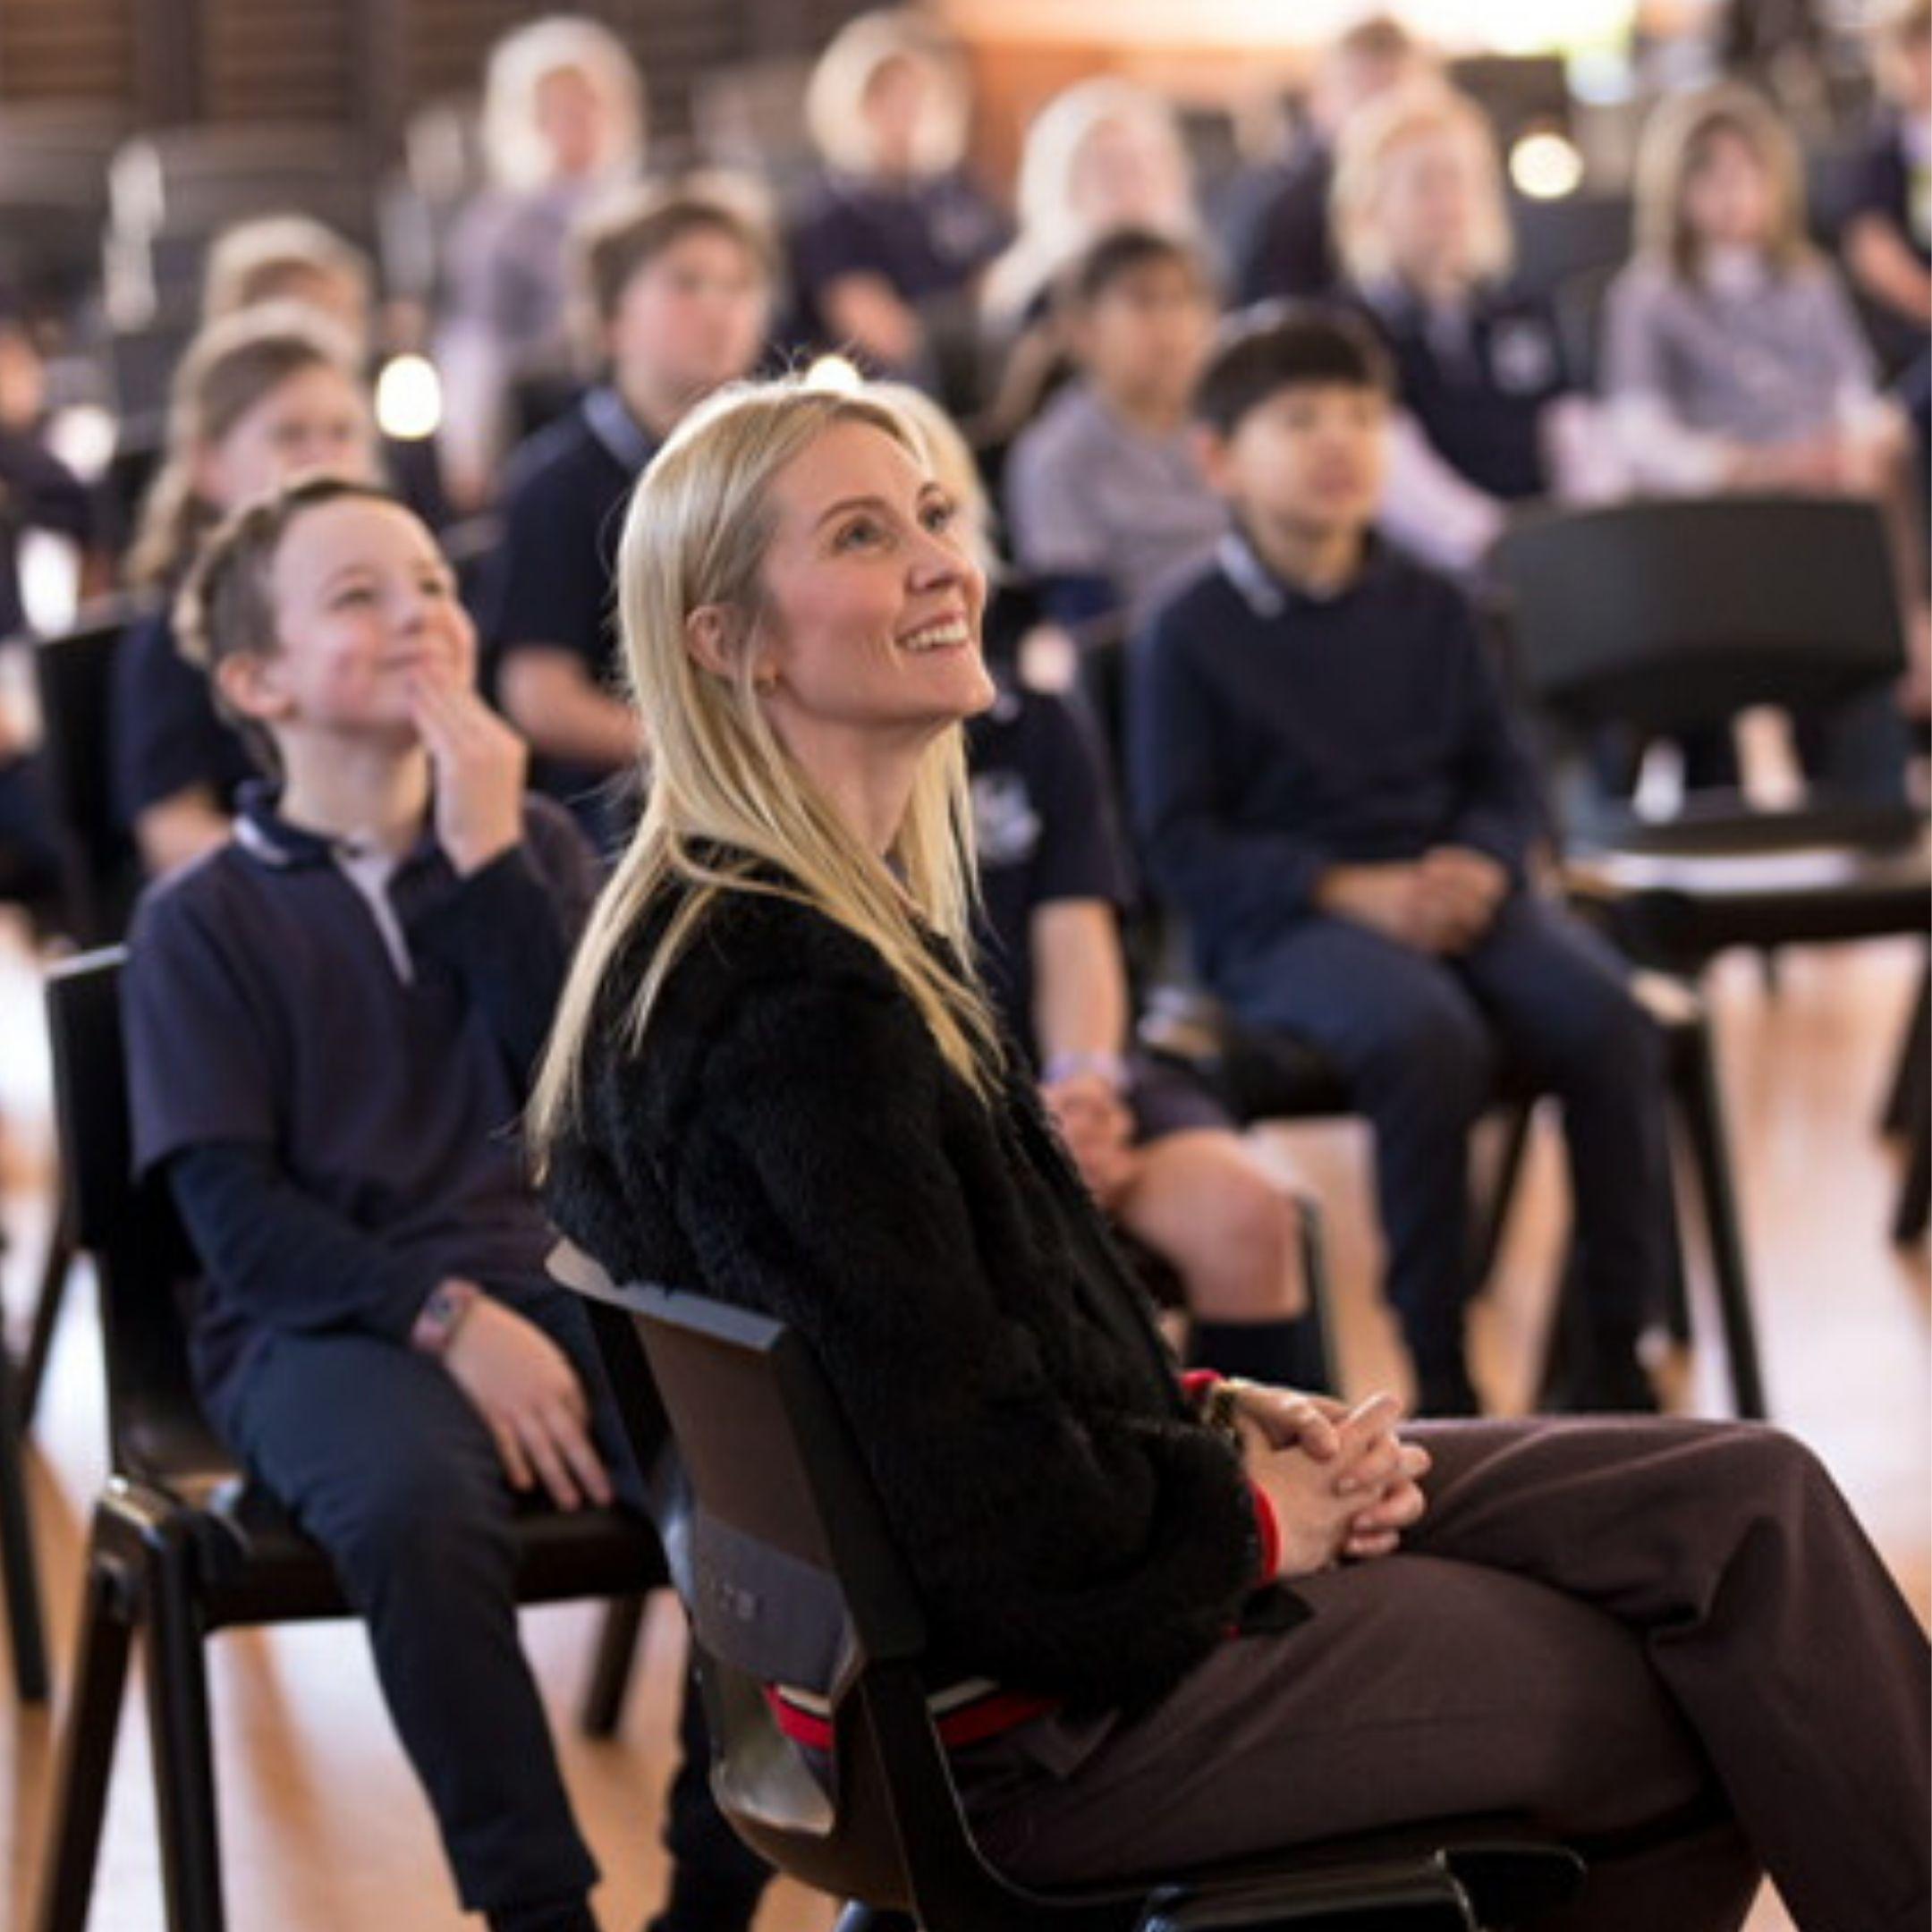 Rebecca-Vonhoff-Toowoomba-East-State-School